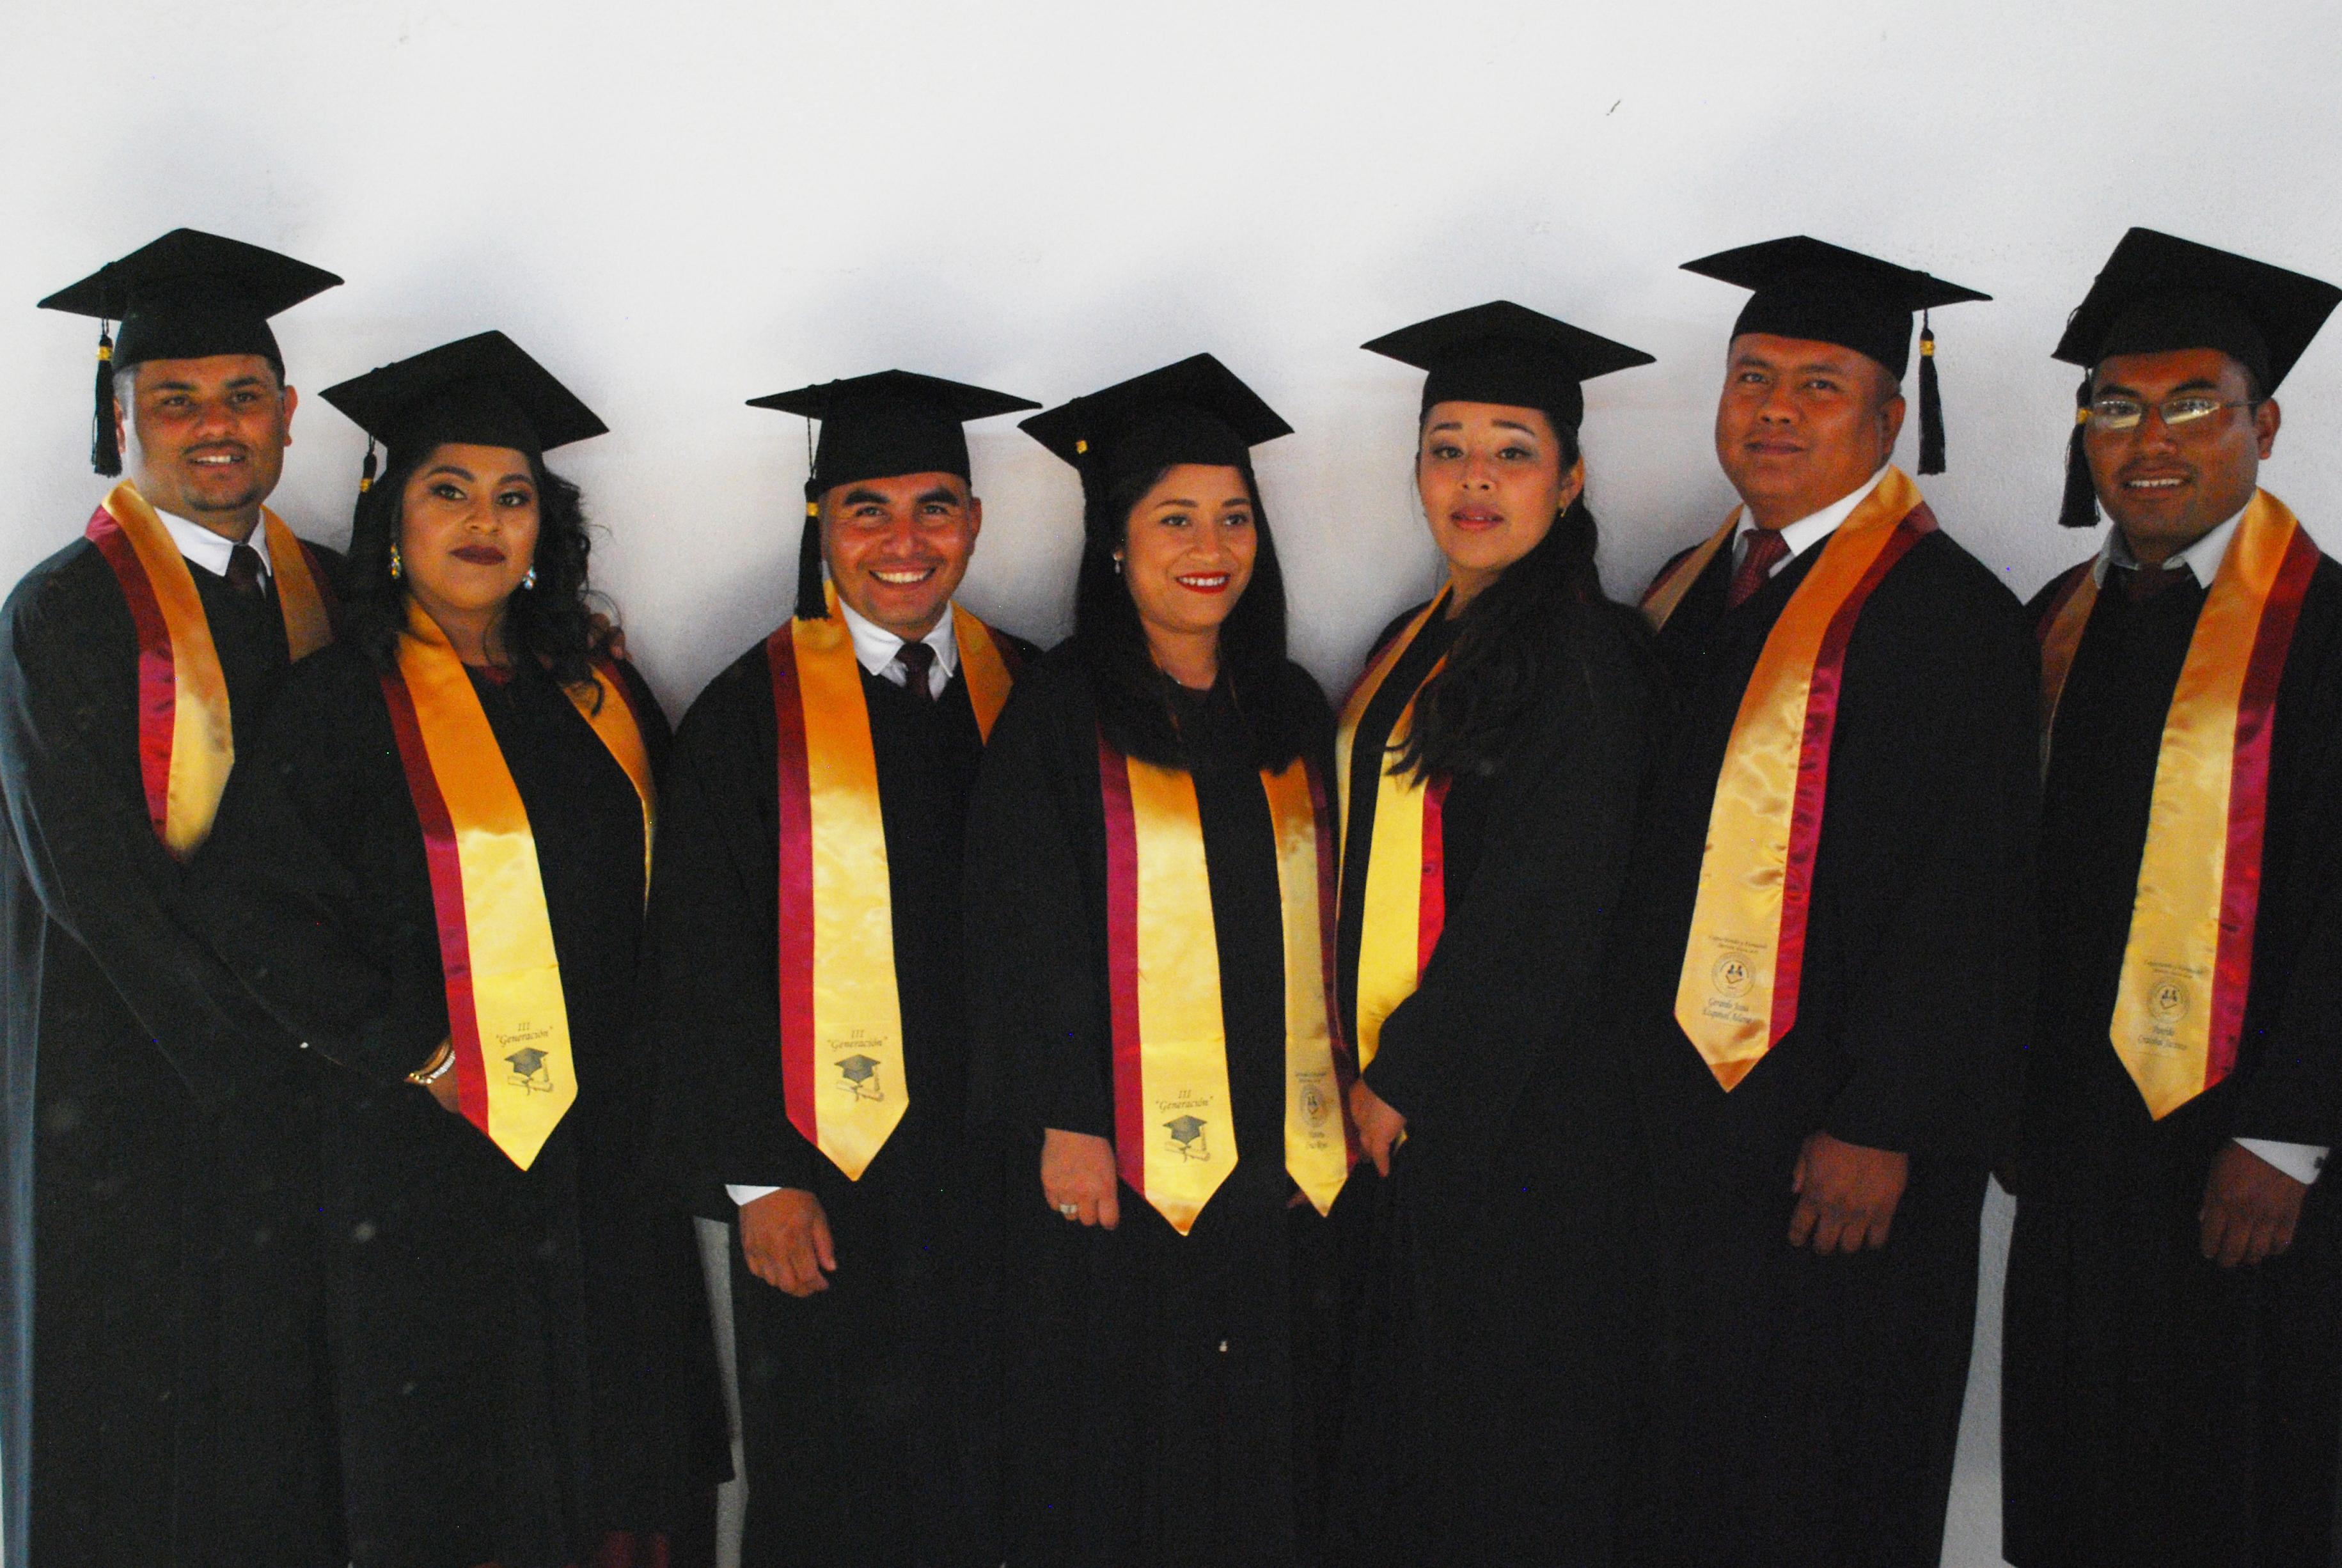 BBI Class of 2018